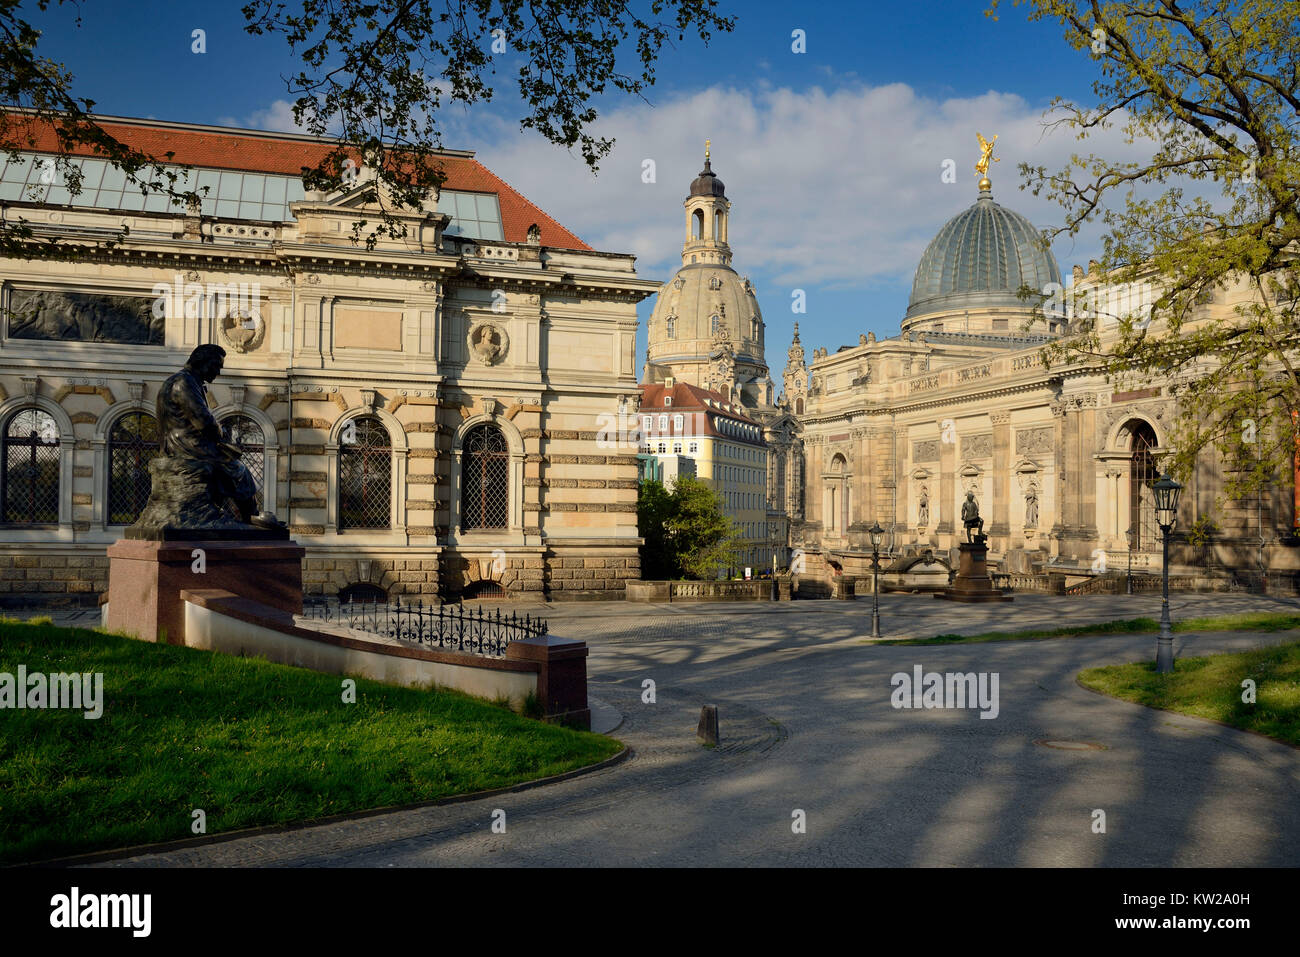 Dresden, Albertinum, Church of Our Lady and Lipsiusbau, Frauenkirche und Lipsiusbau - Stock Image